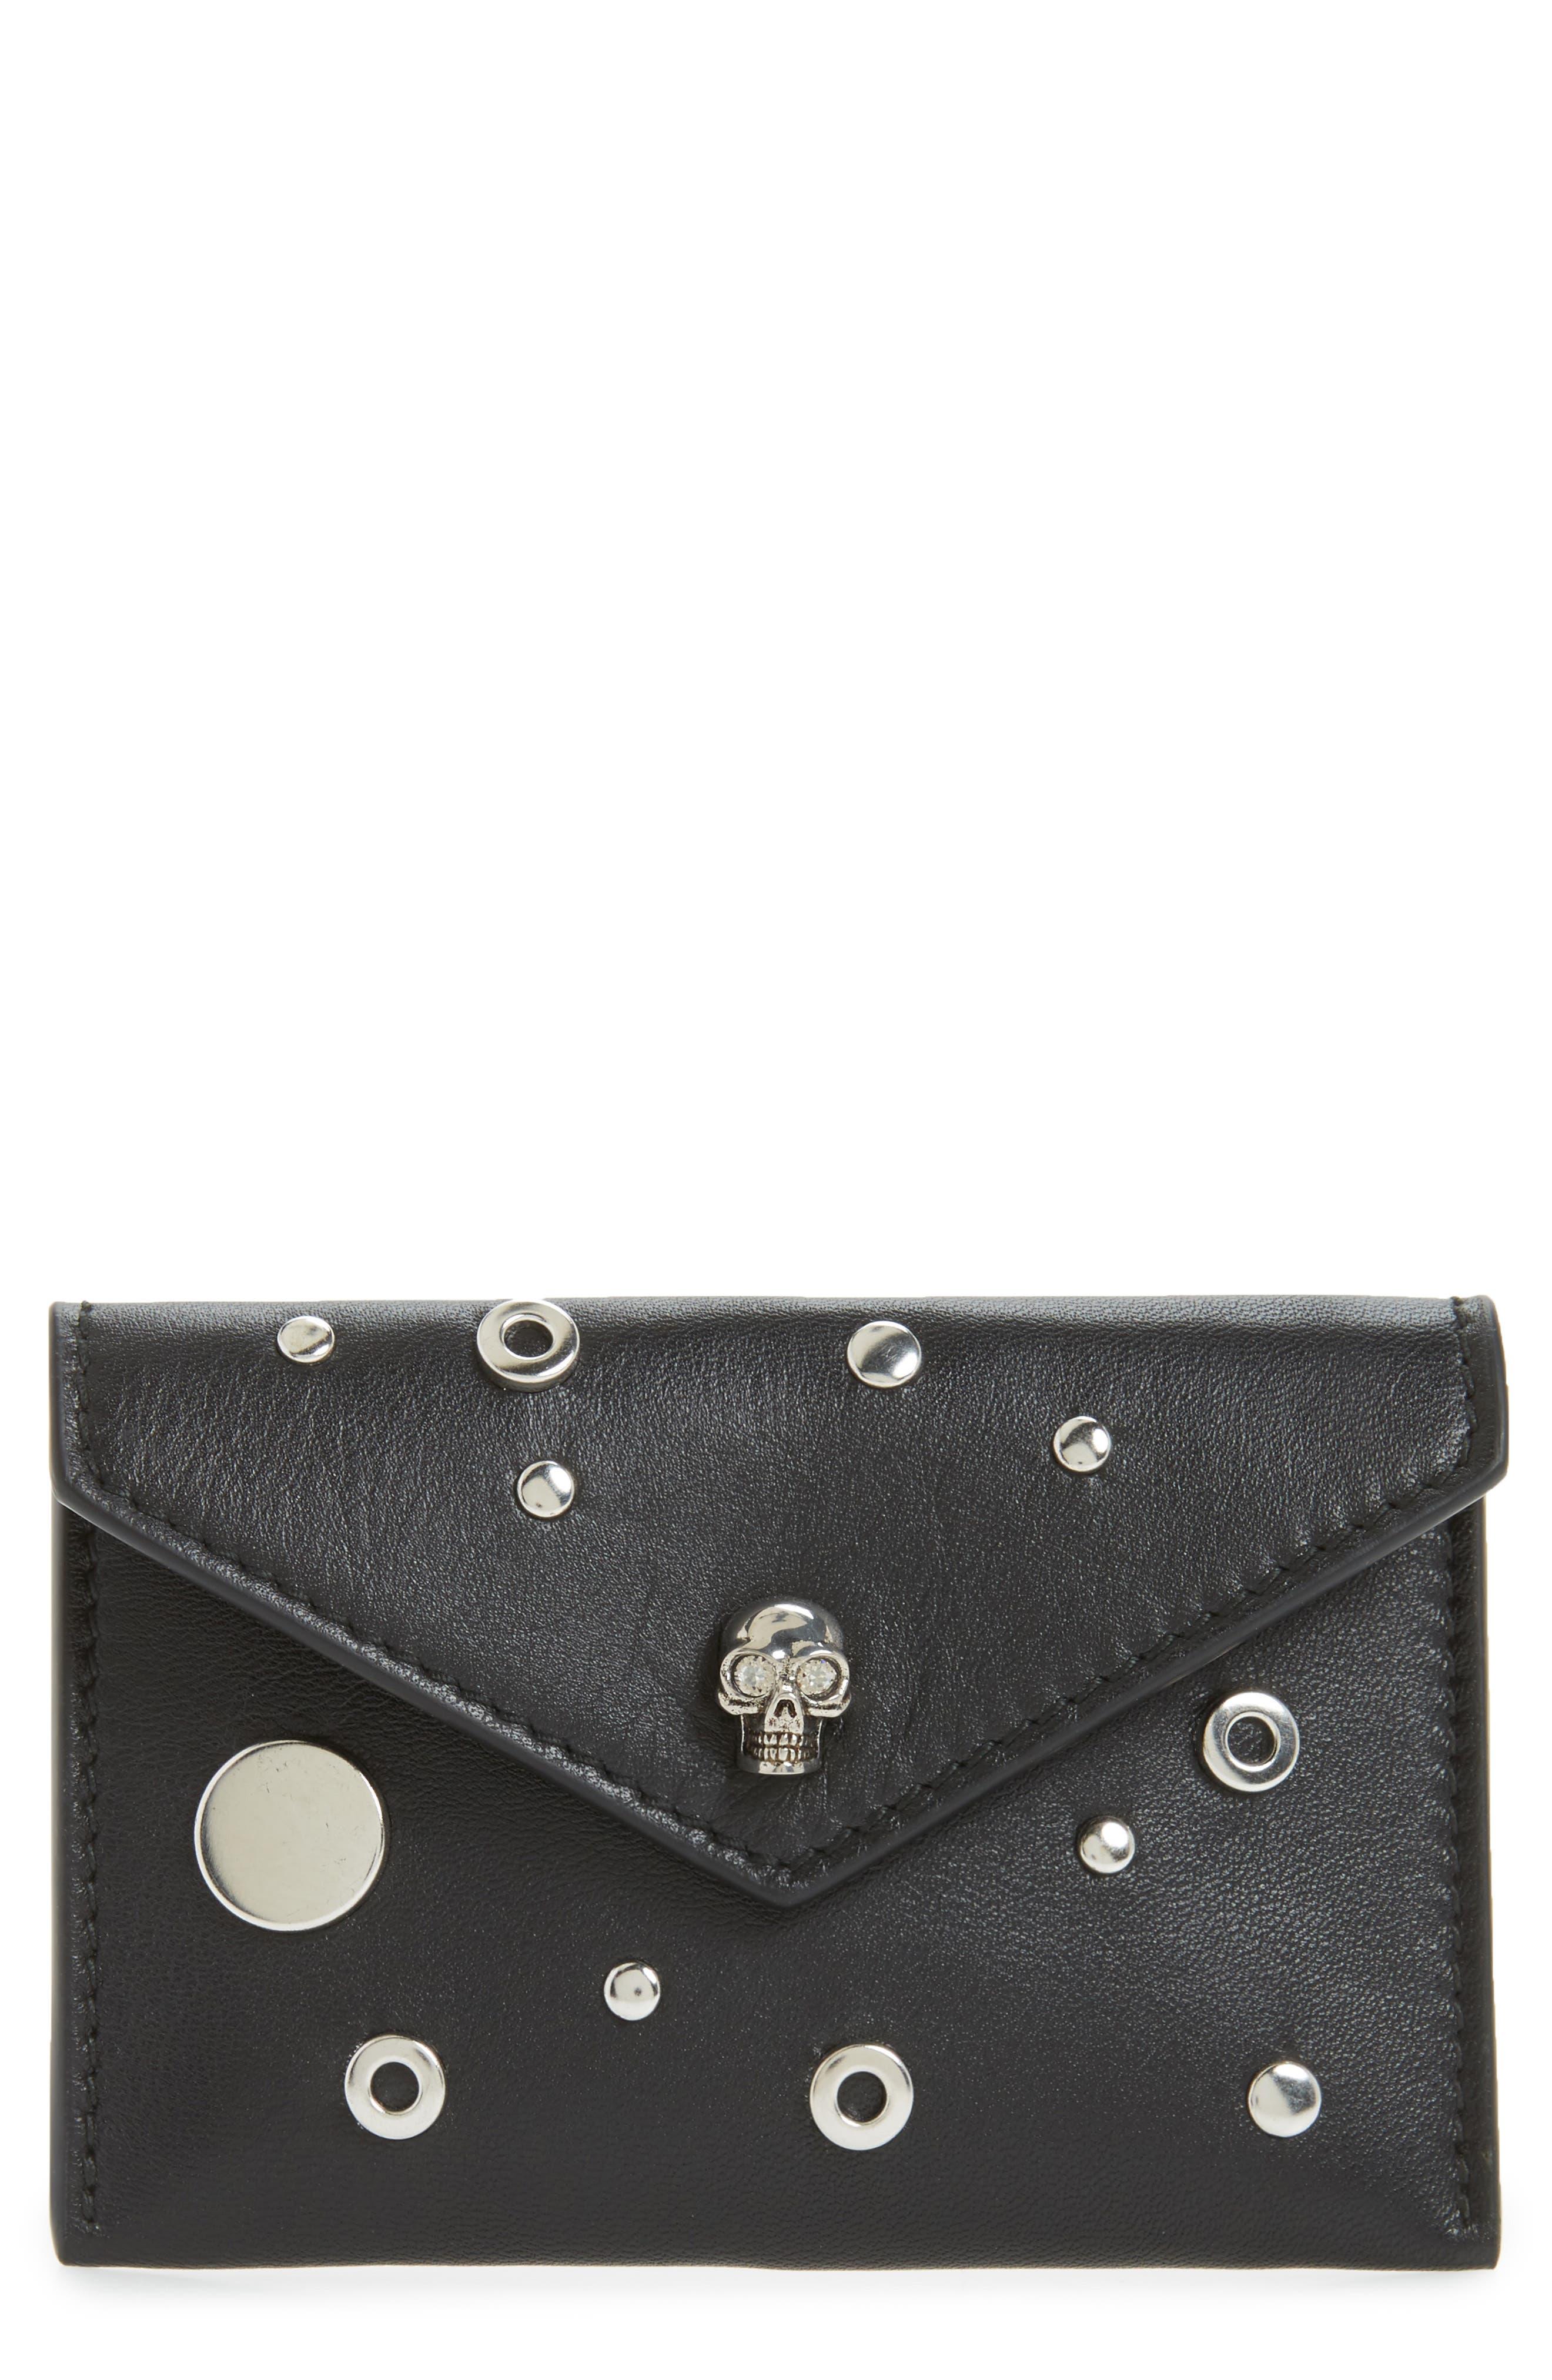 Calfskin Leather Envelope Card Holder,                             Main thumbnail 1, color,                             Black